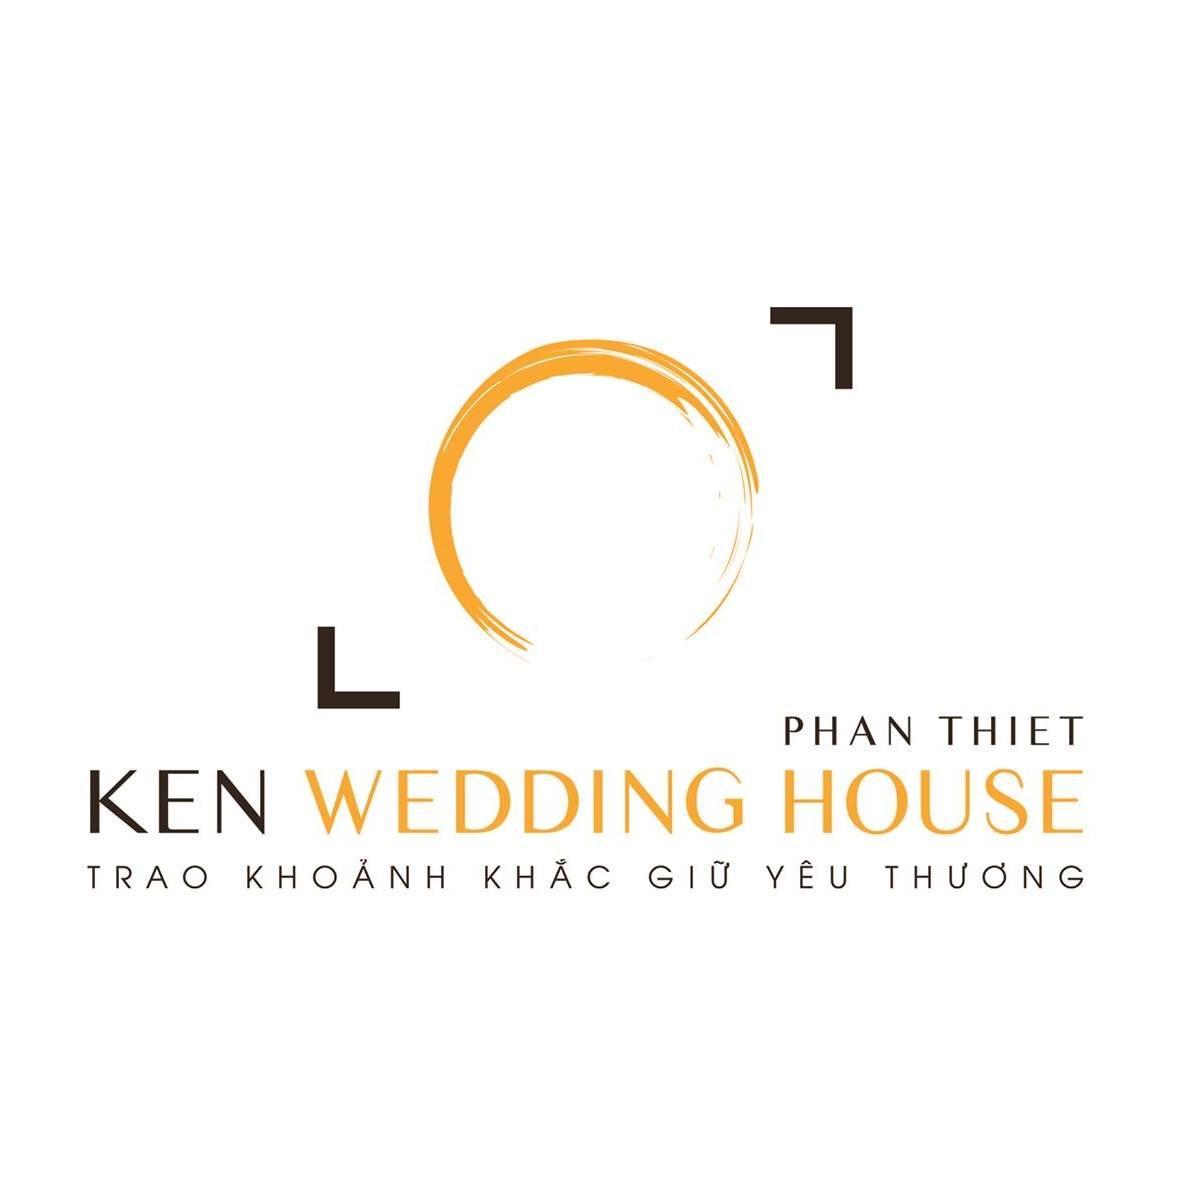 KEN Wedding House - Phan Thiết